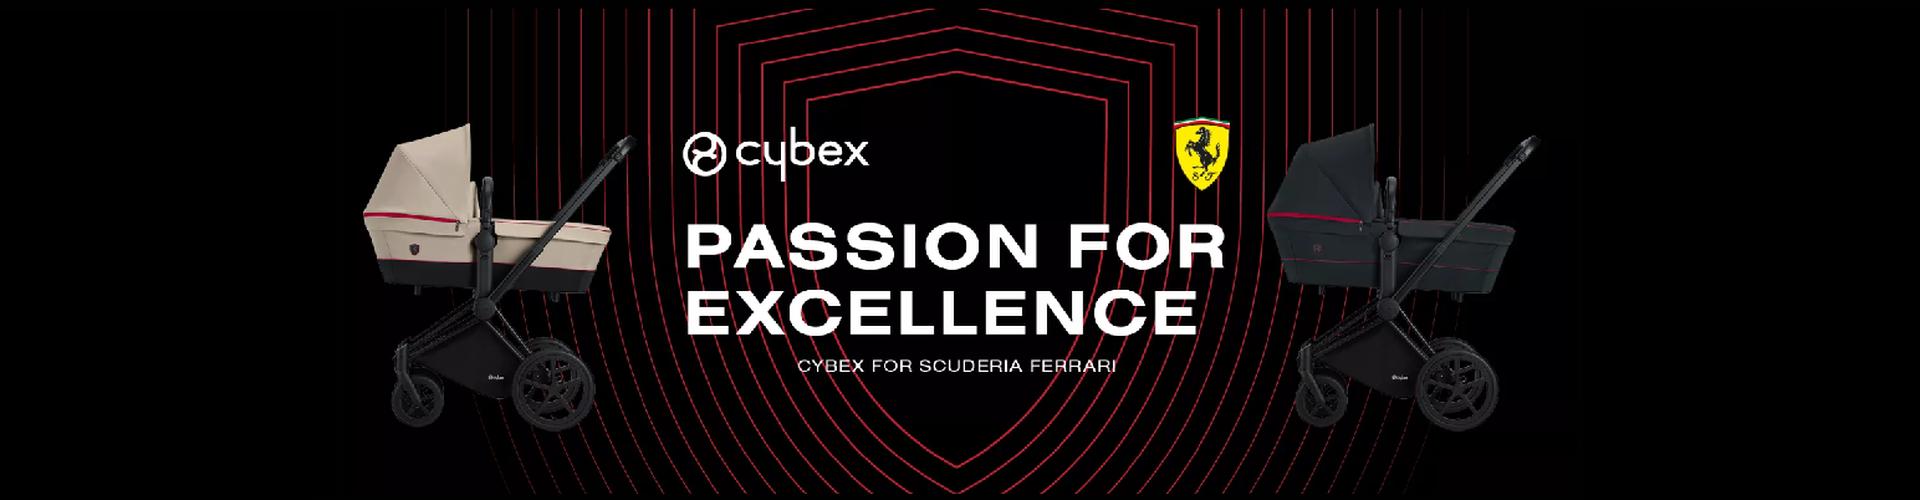 Ferrari Cybex